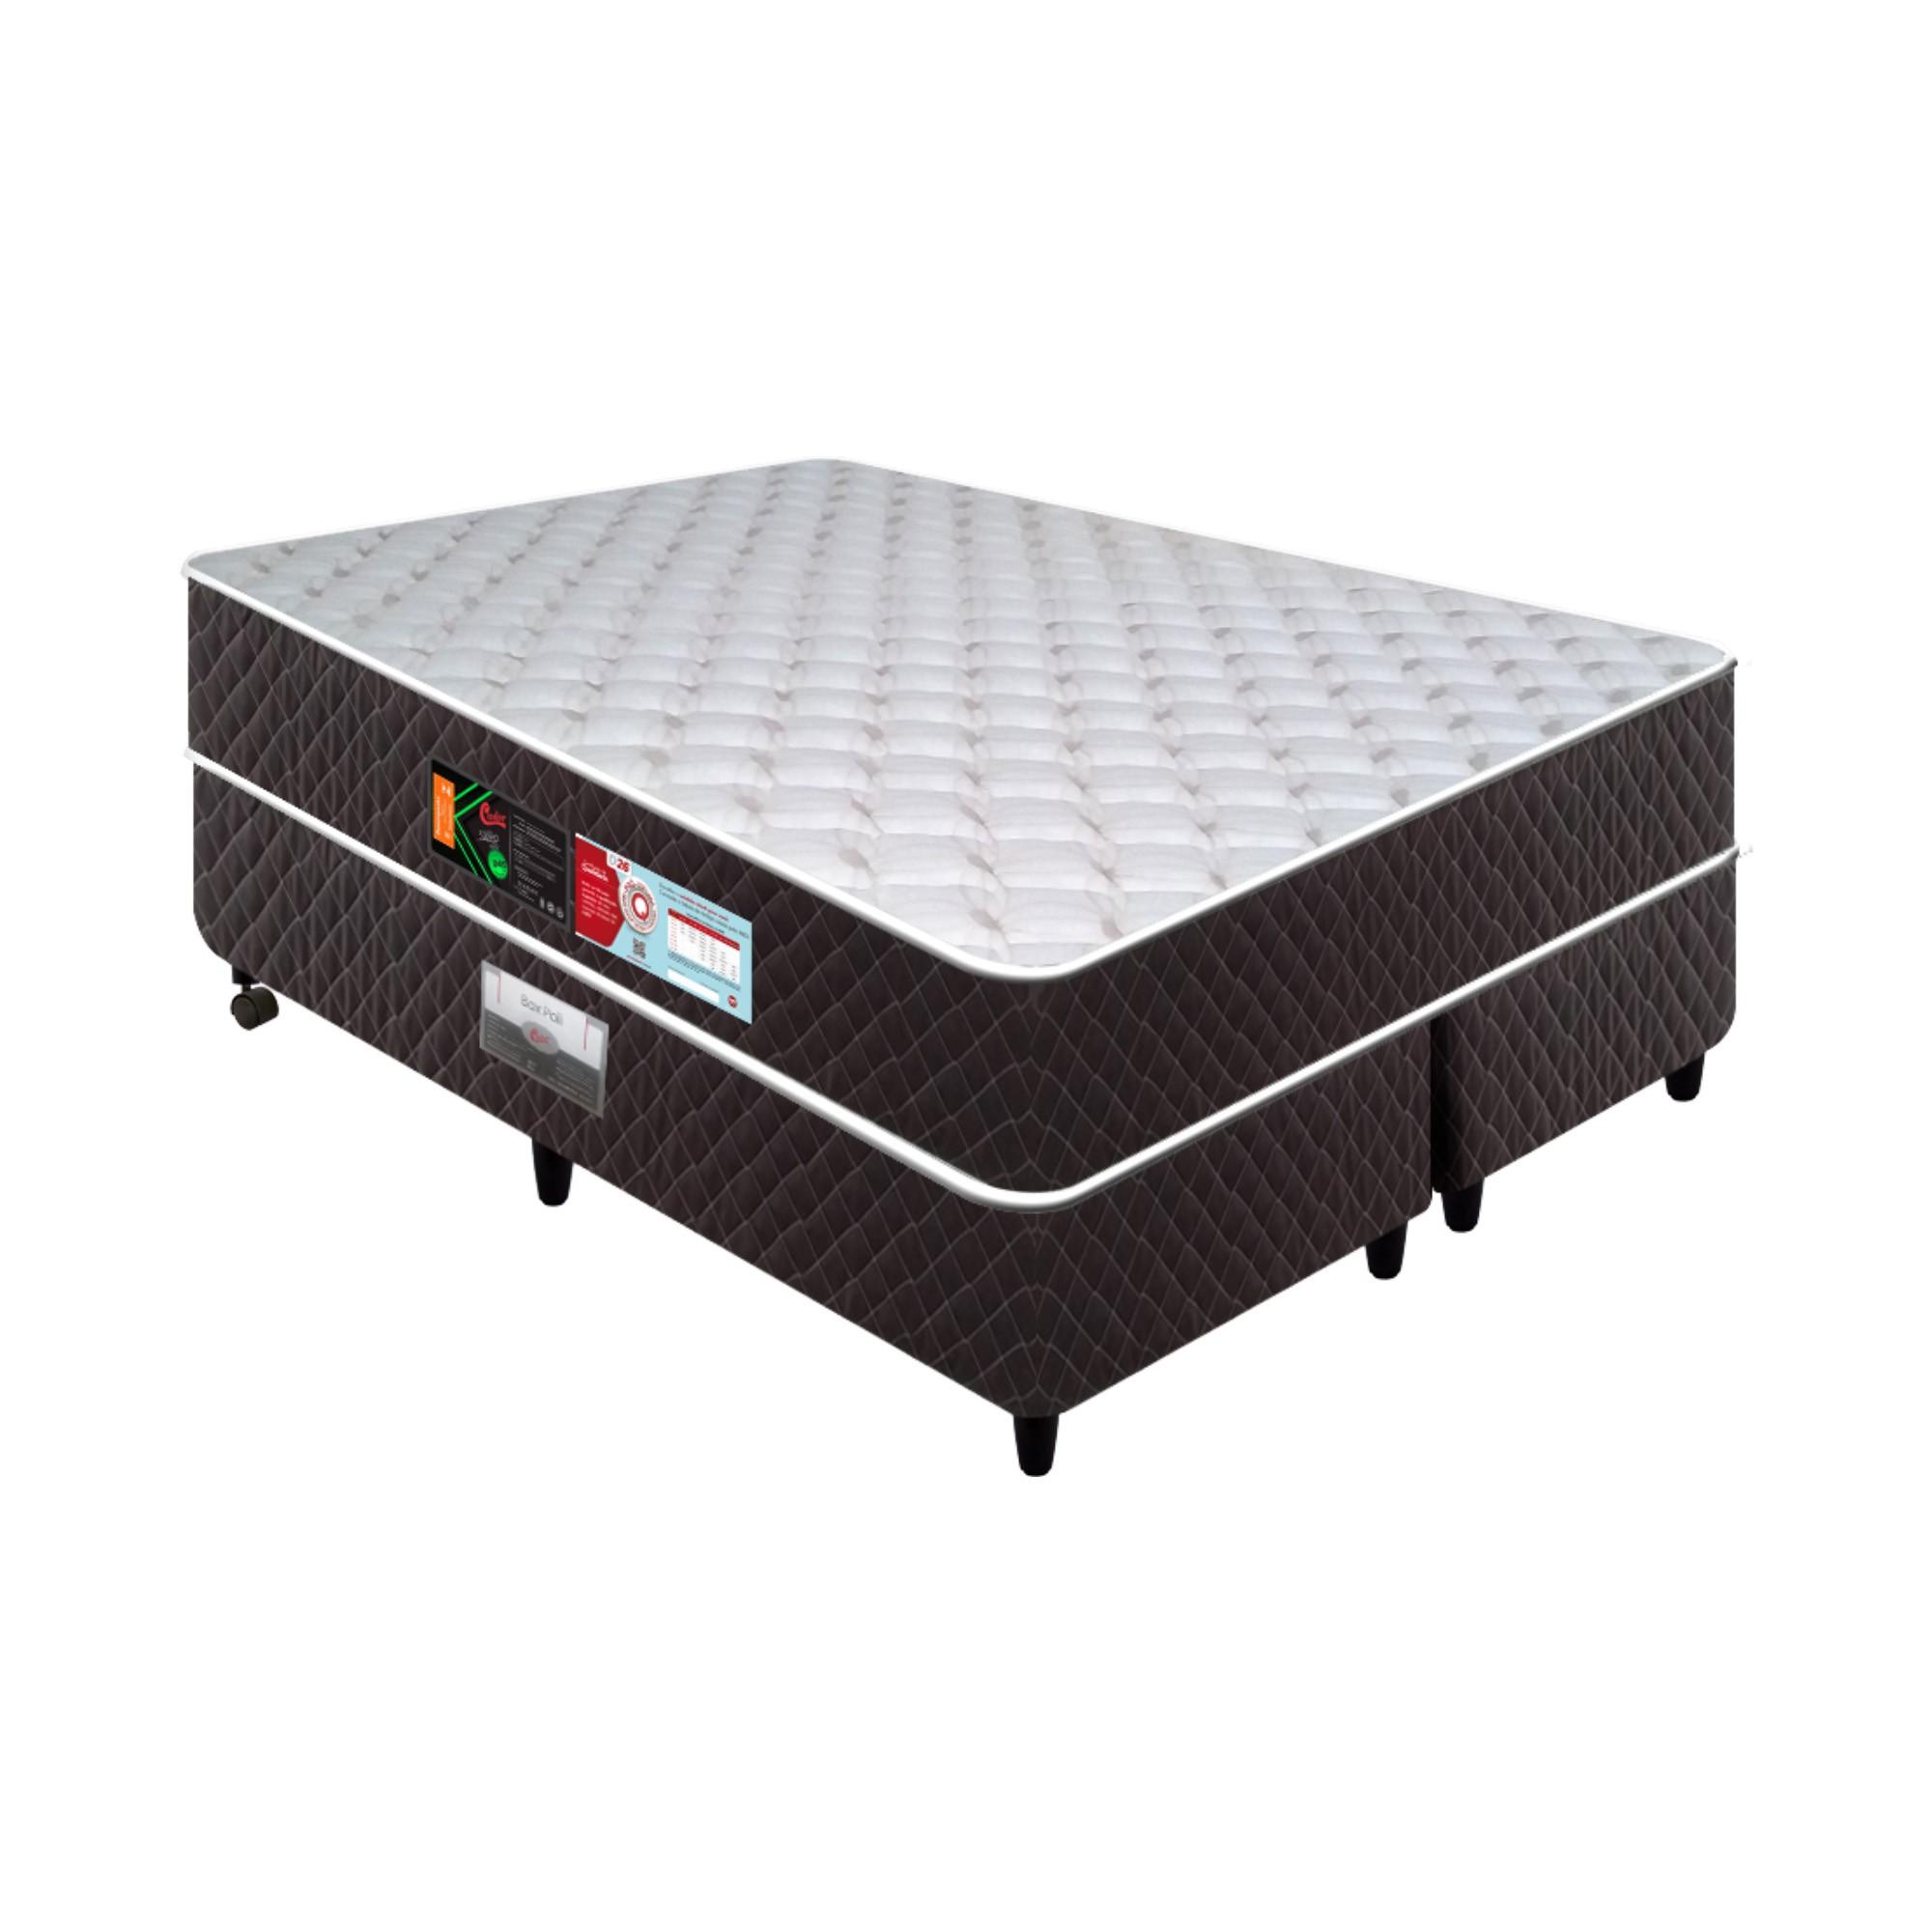 Conjunto Box Castor Sleep Max D28 [Queen 158 x 198 cm]